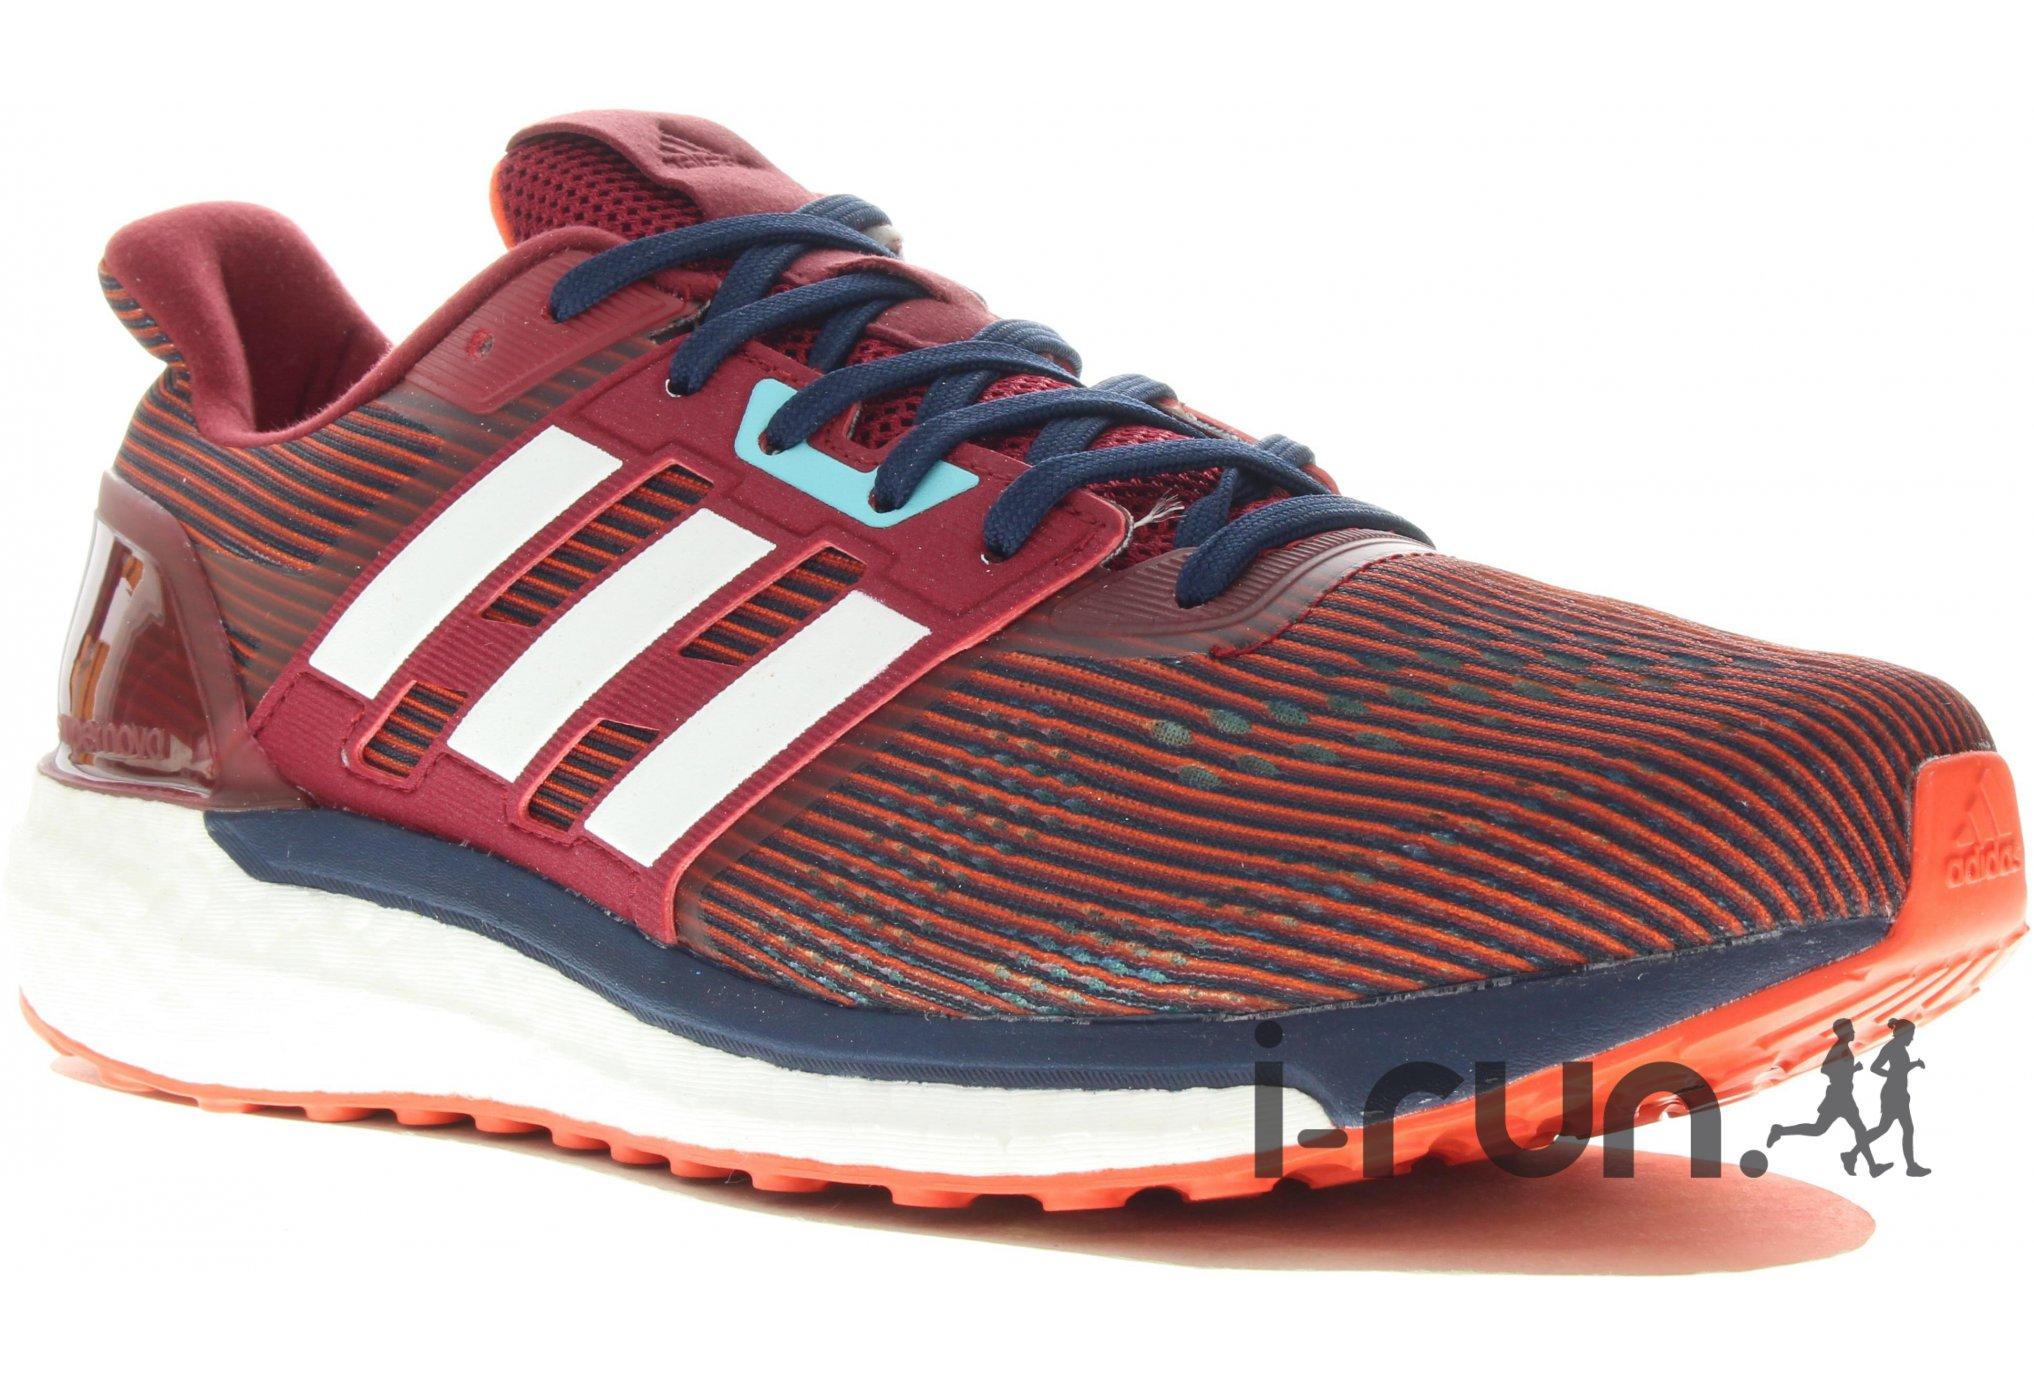 Adidas Supernova m chaussures homme